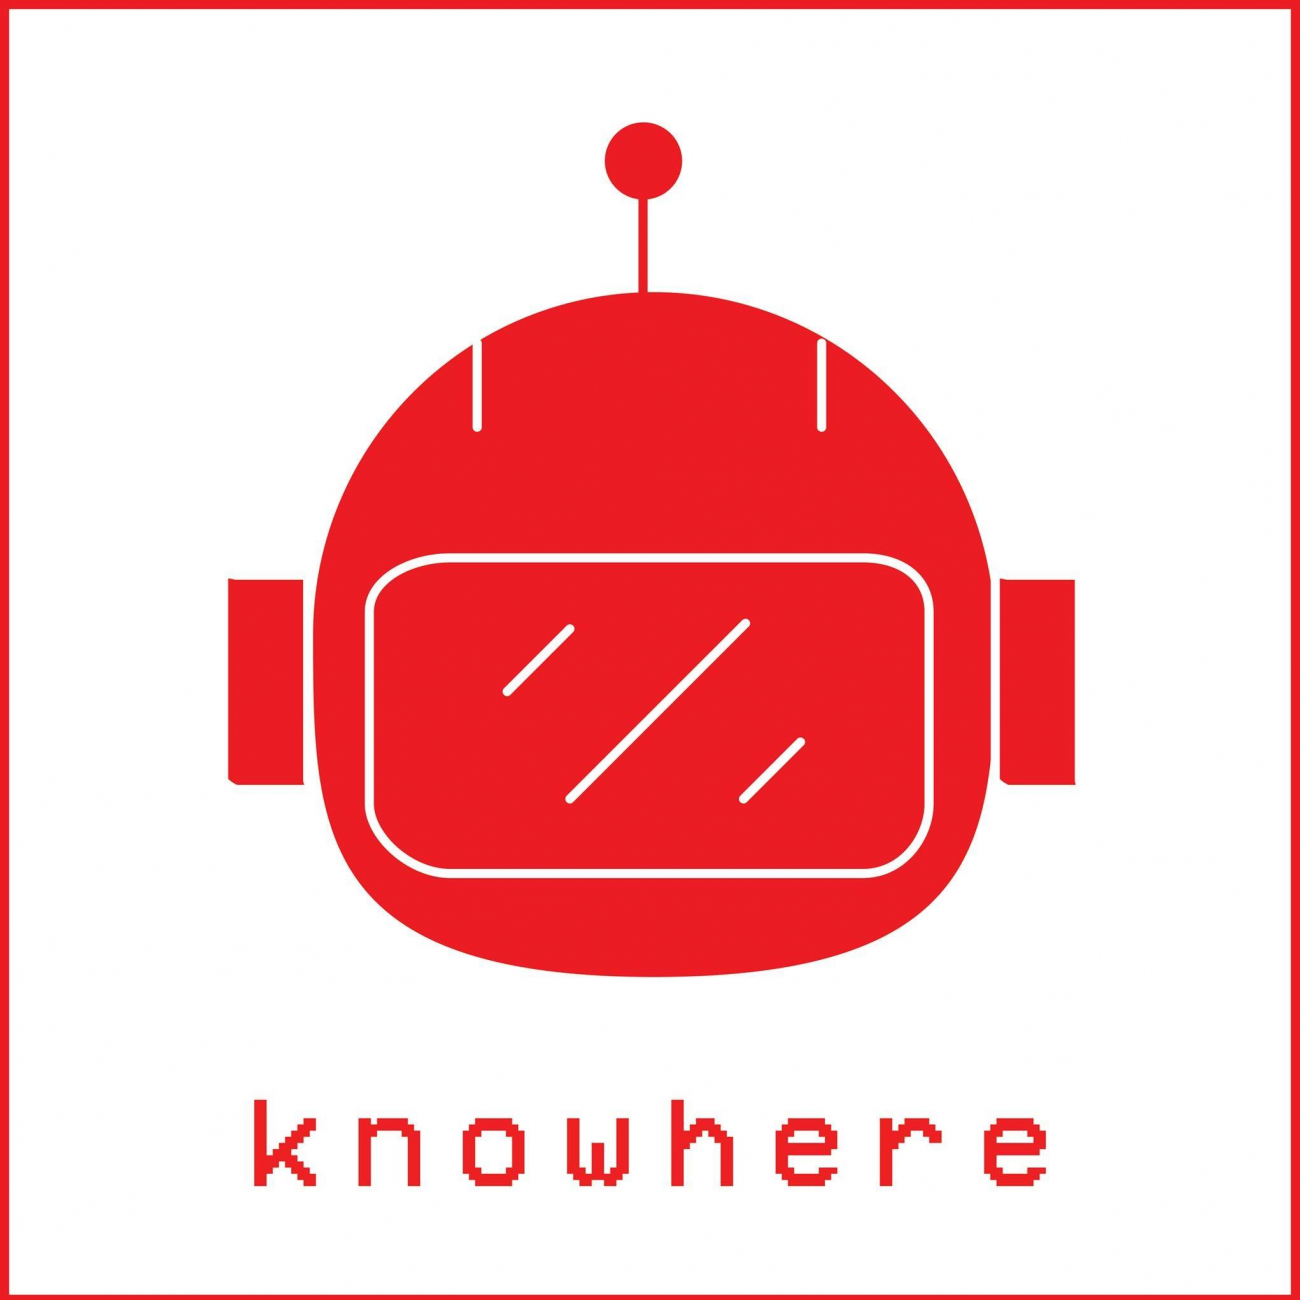 Cửa hàng phụ kiện điện thoại Knowhere Saigon